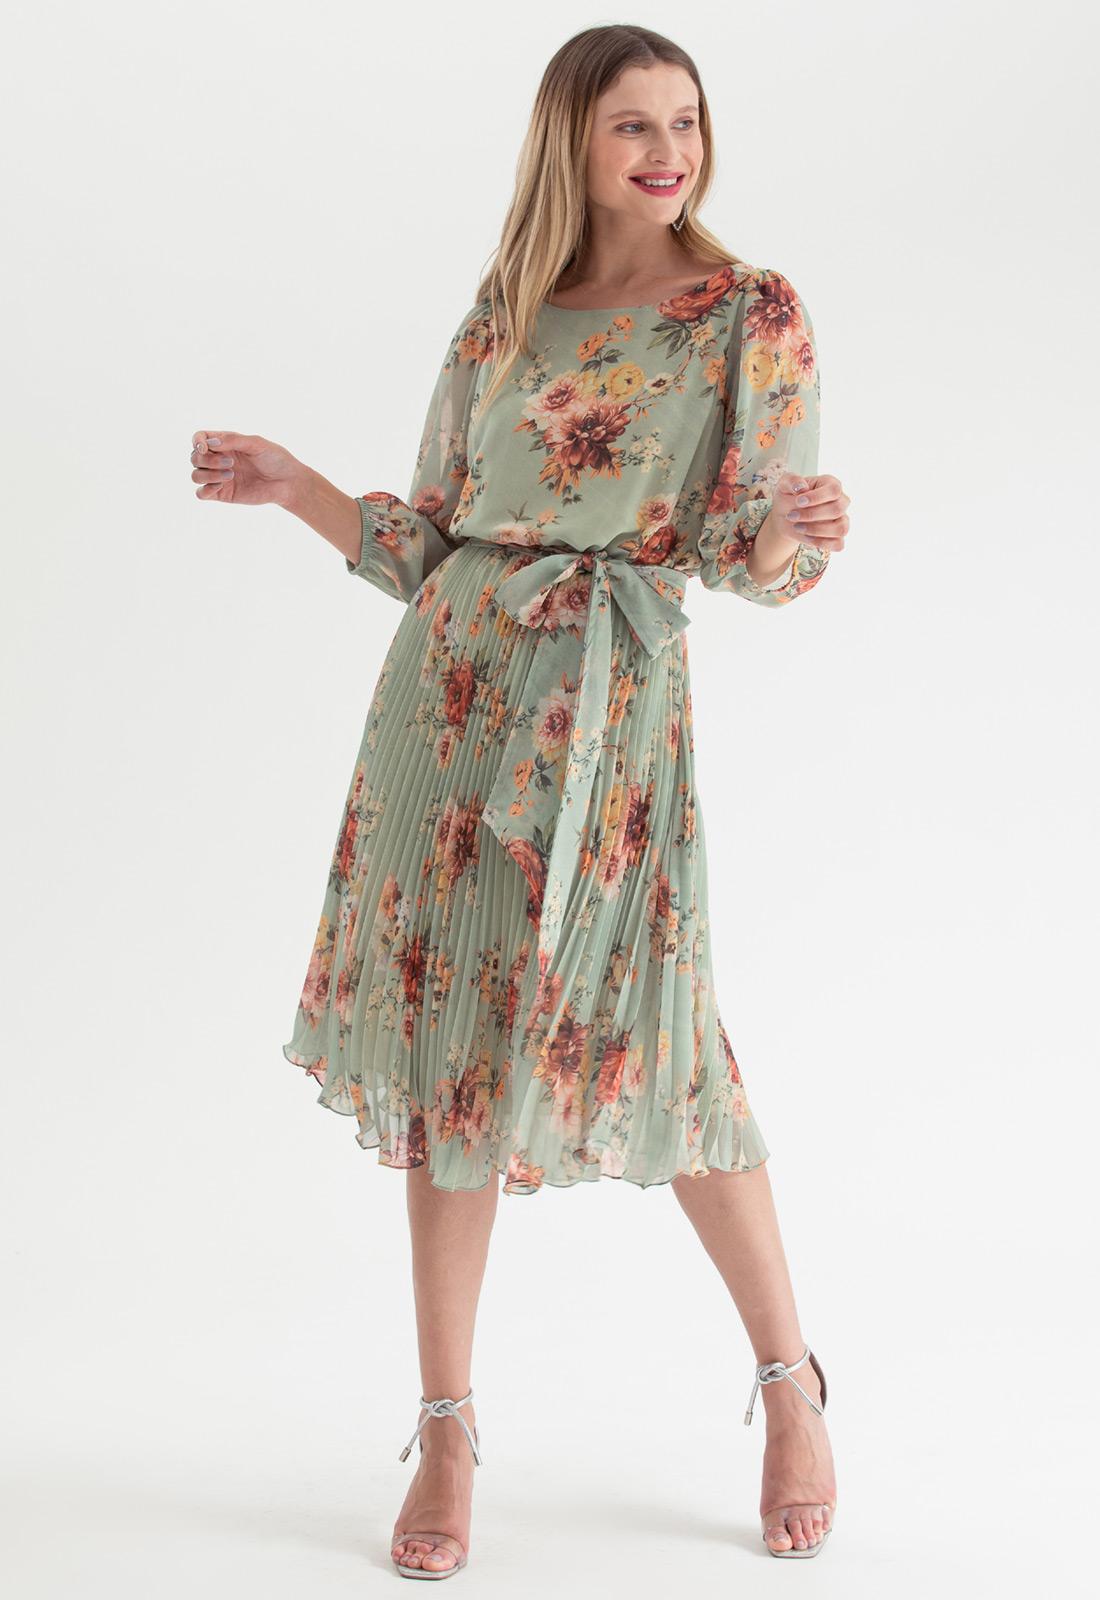 Vestido plissado midi floral Verde oliva Ref. 2583